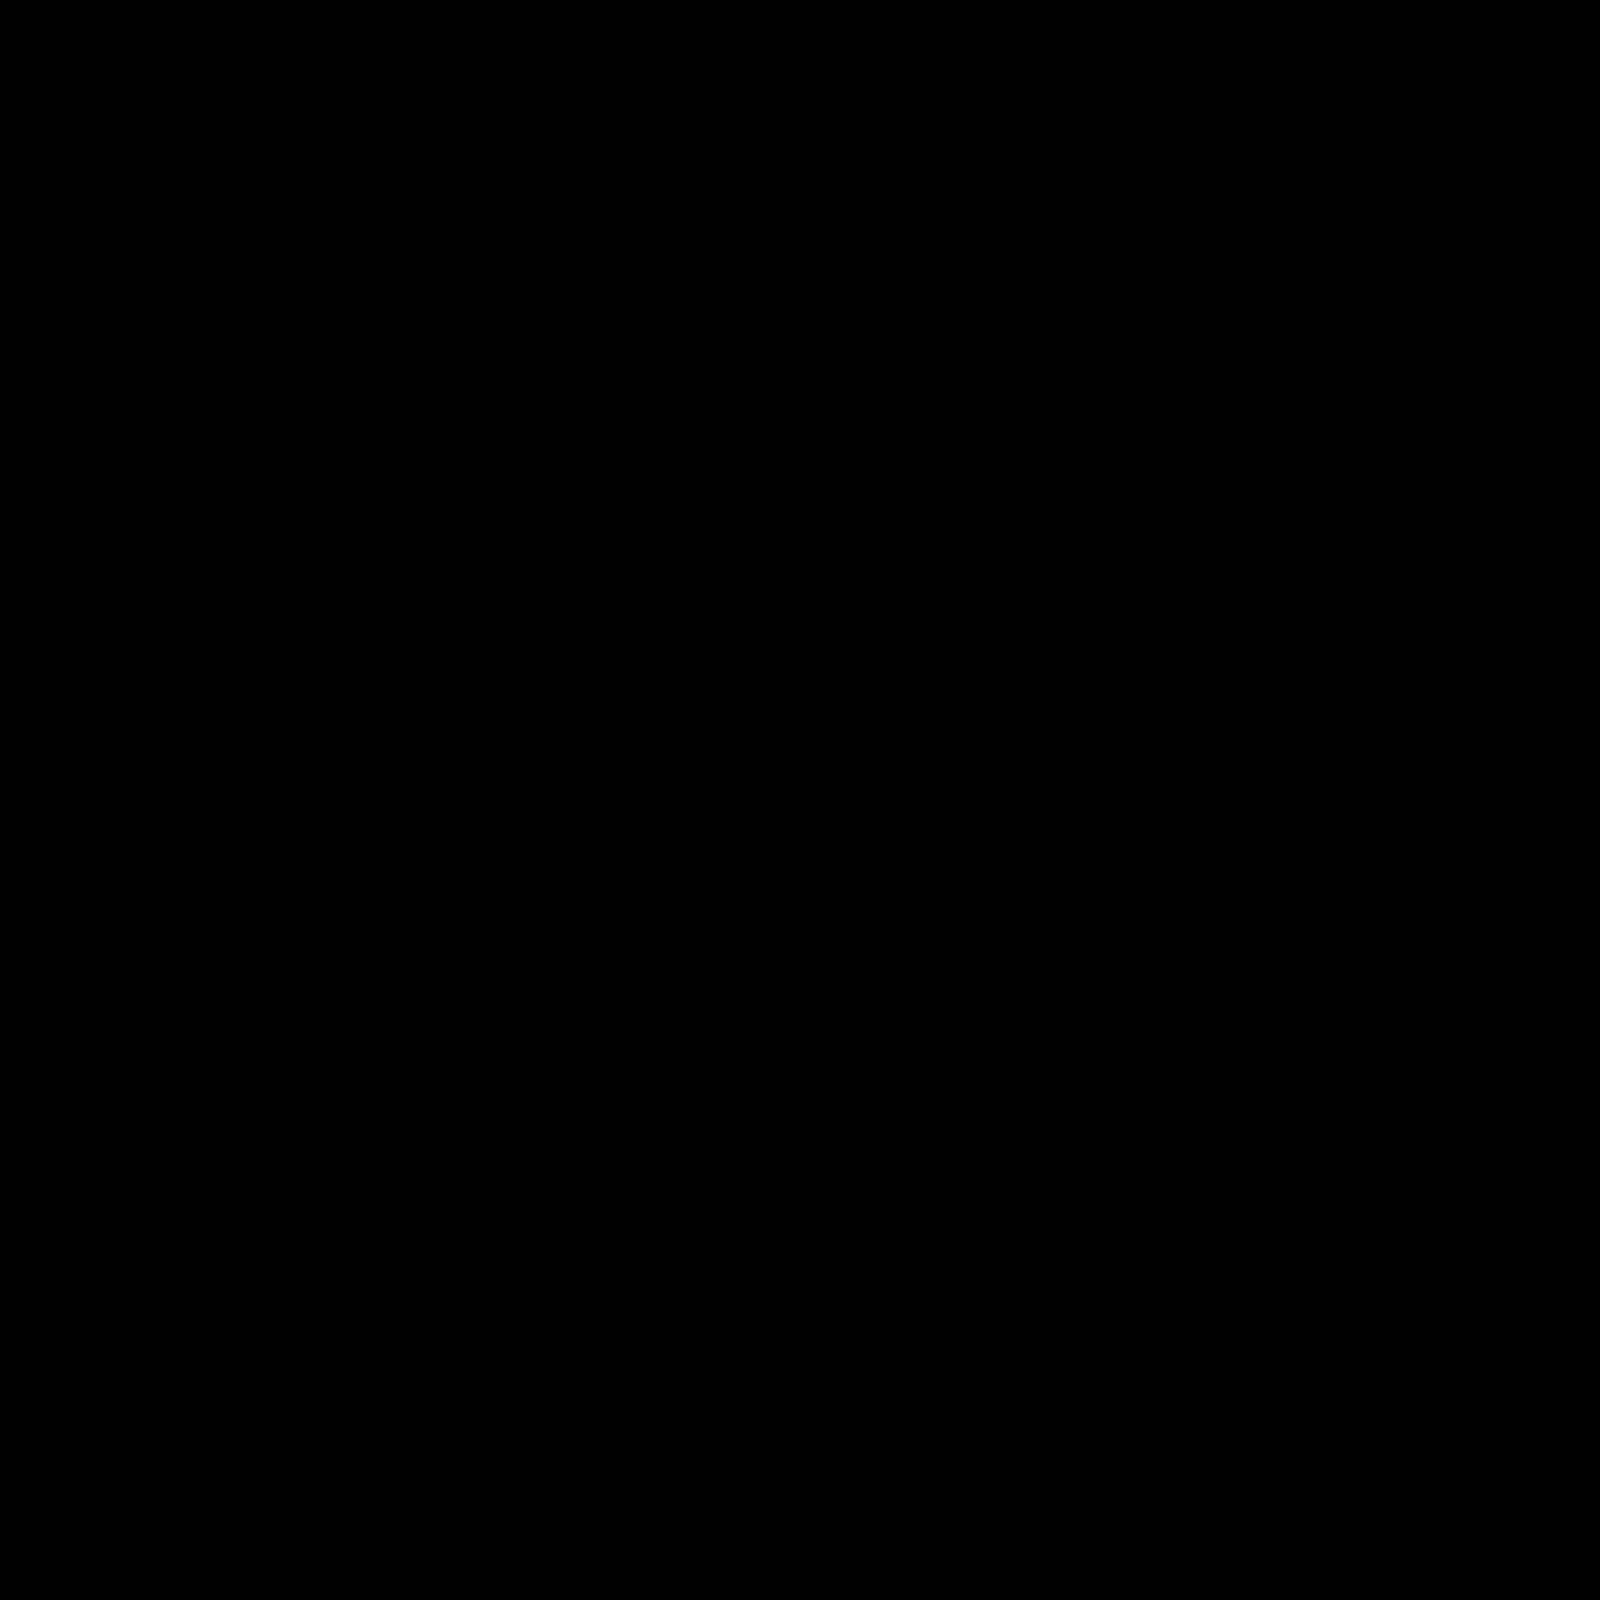 Statut de connexion Off icon